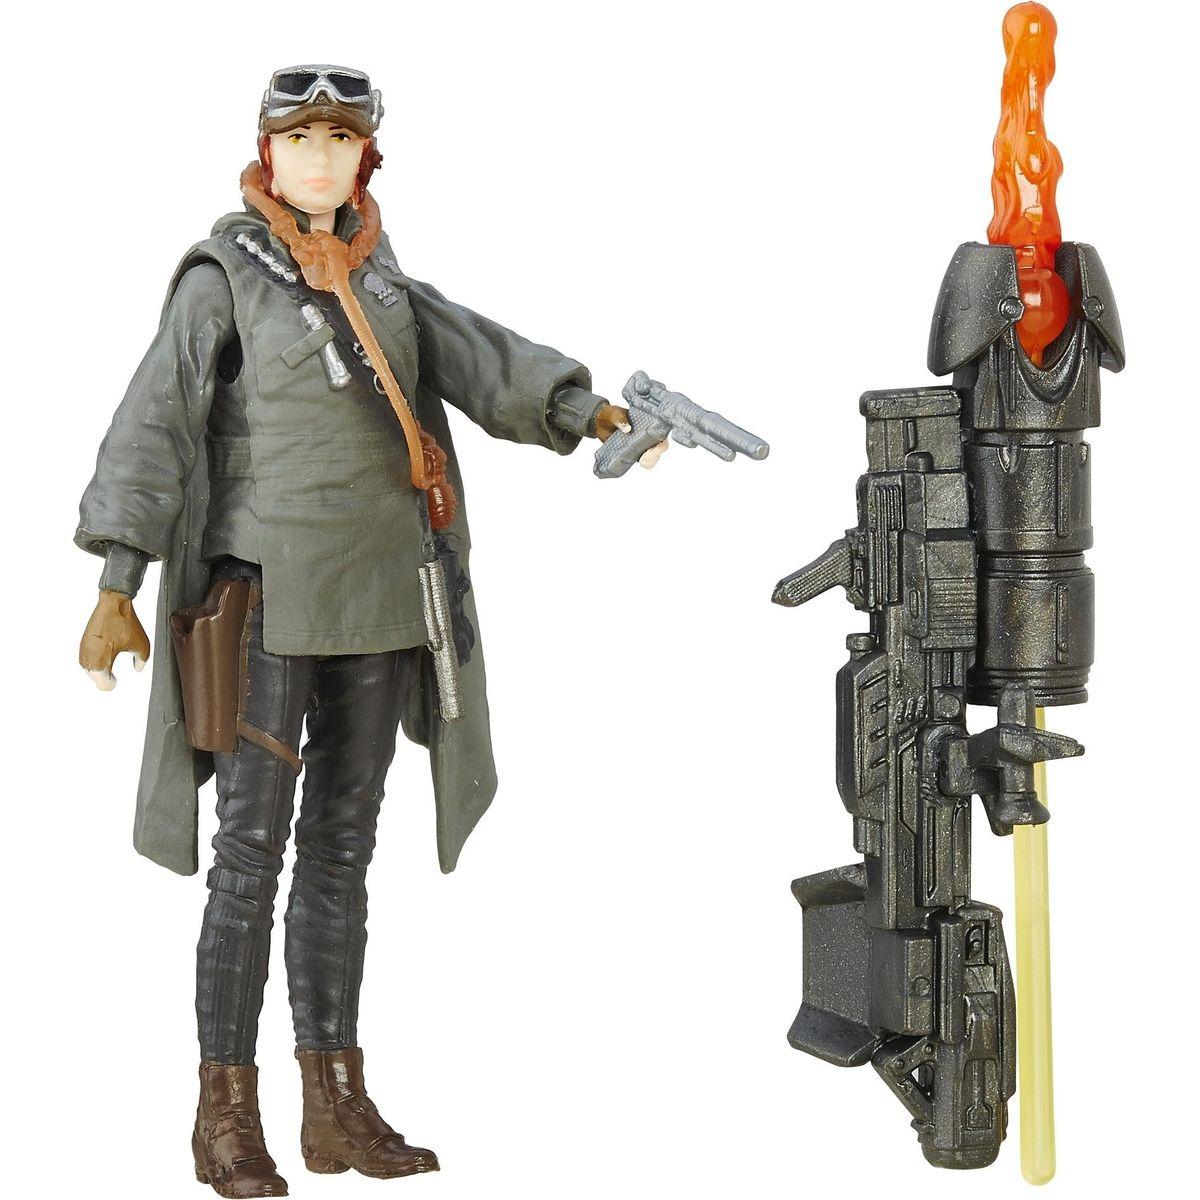 Hasbro Star Wars Rogue One Sergeant Jyn Erso